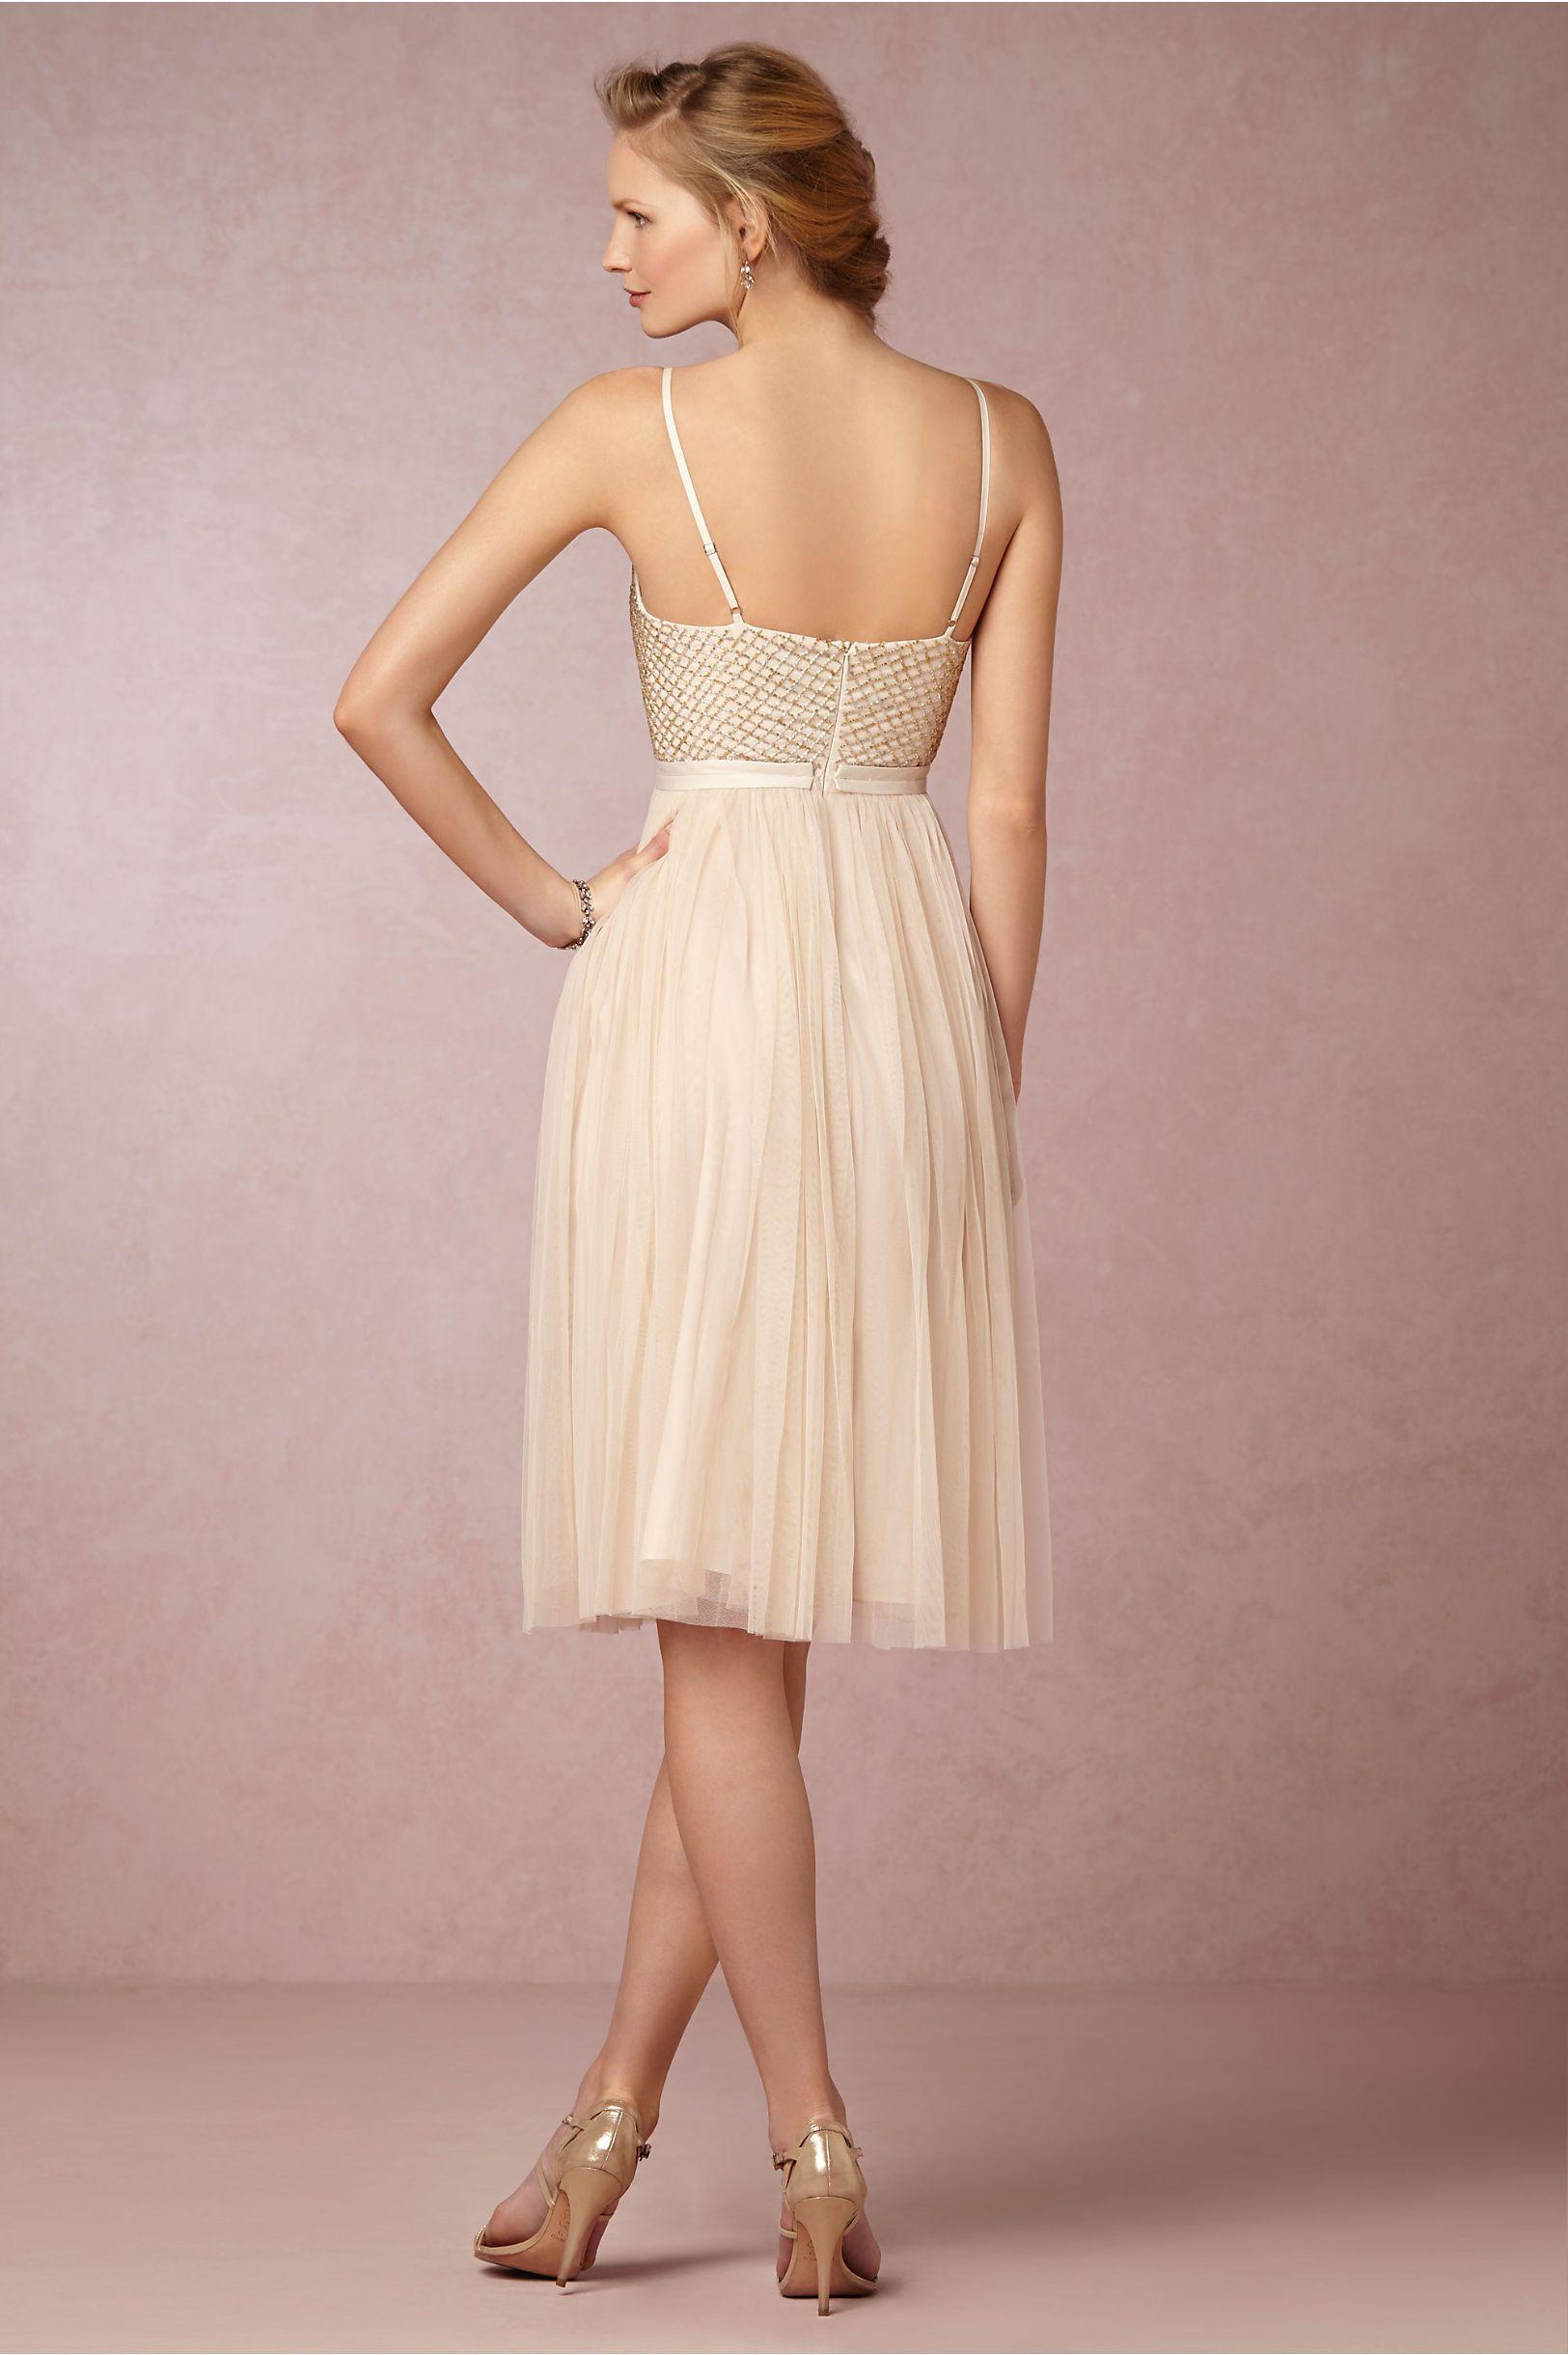 Coppelia Ballet Dress in Swept Away at BHLDN | Gold | Pinterest